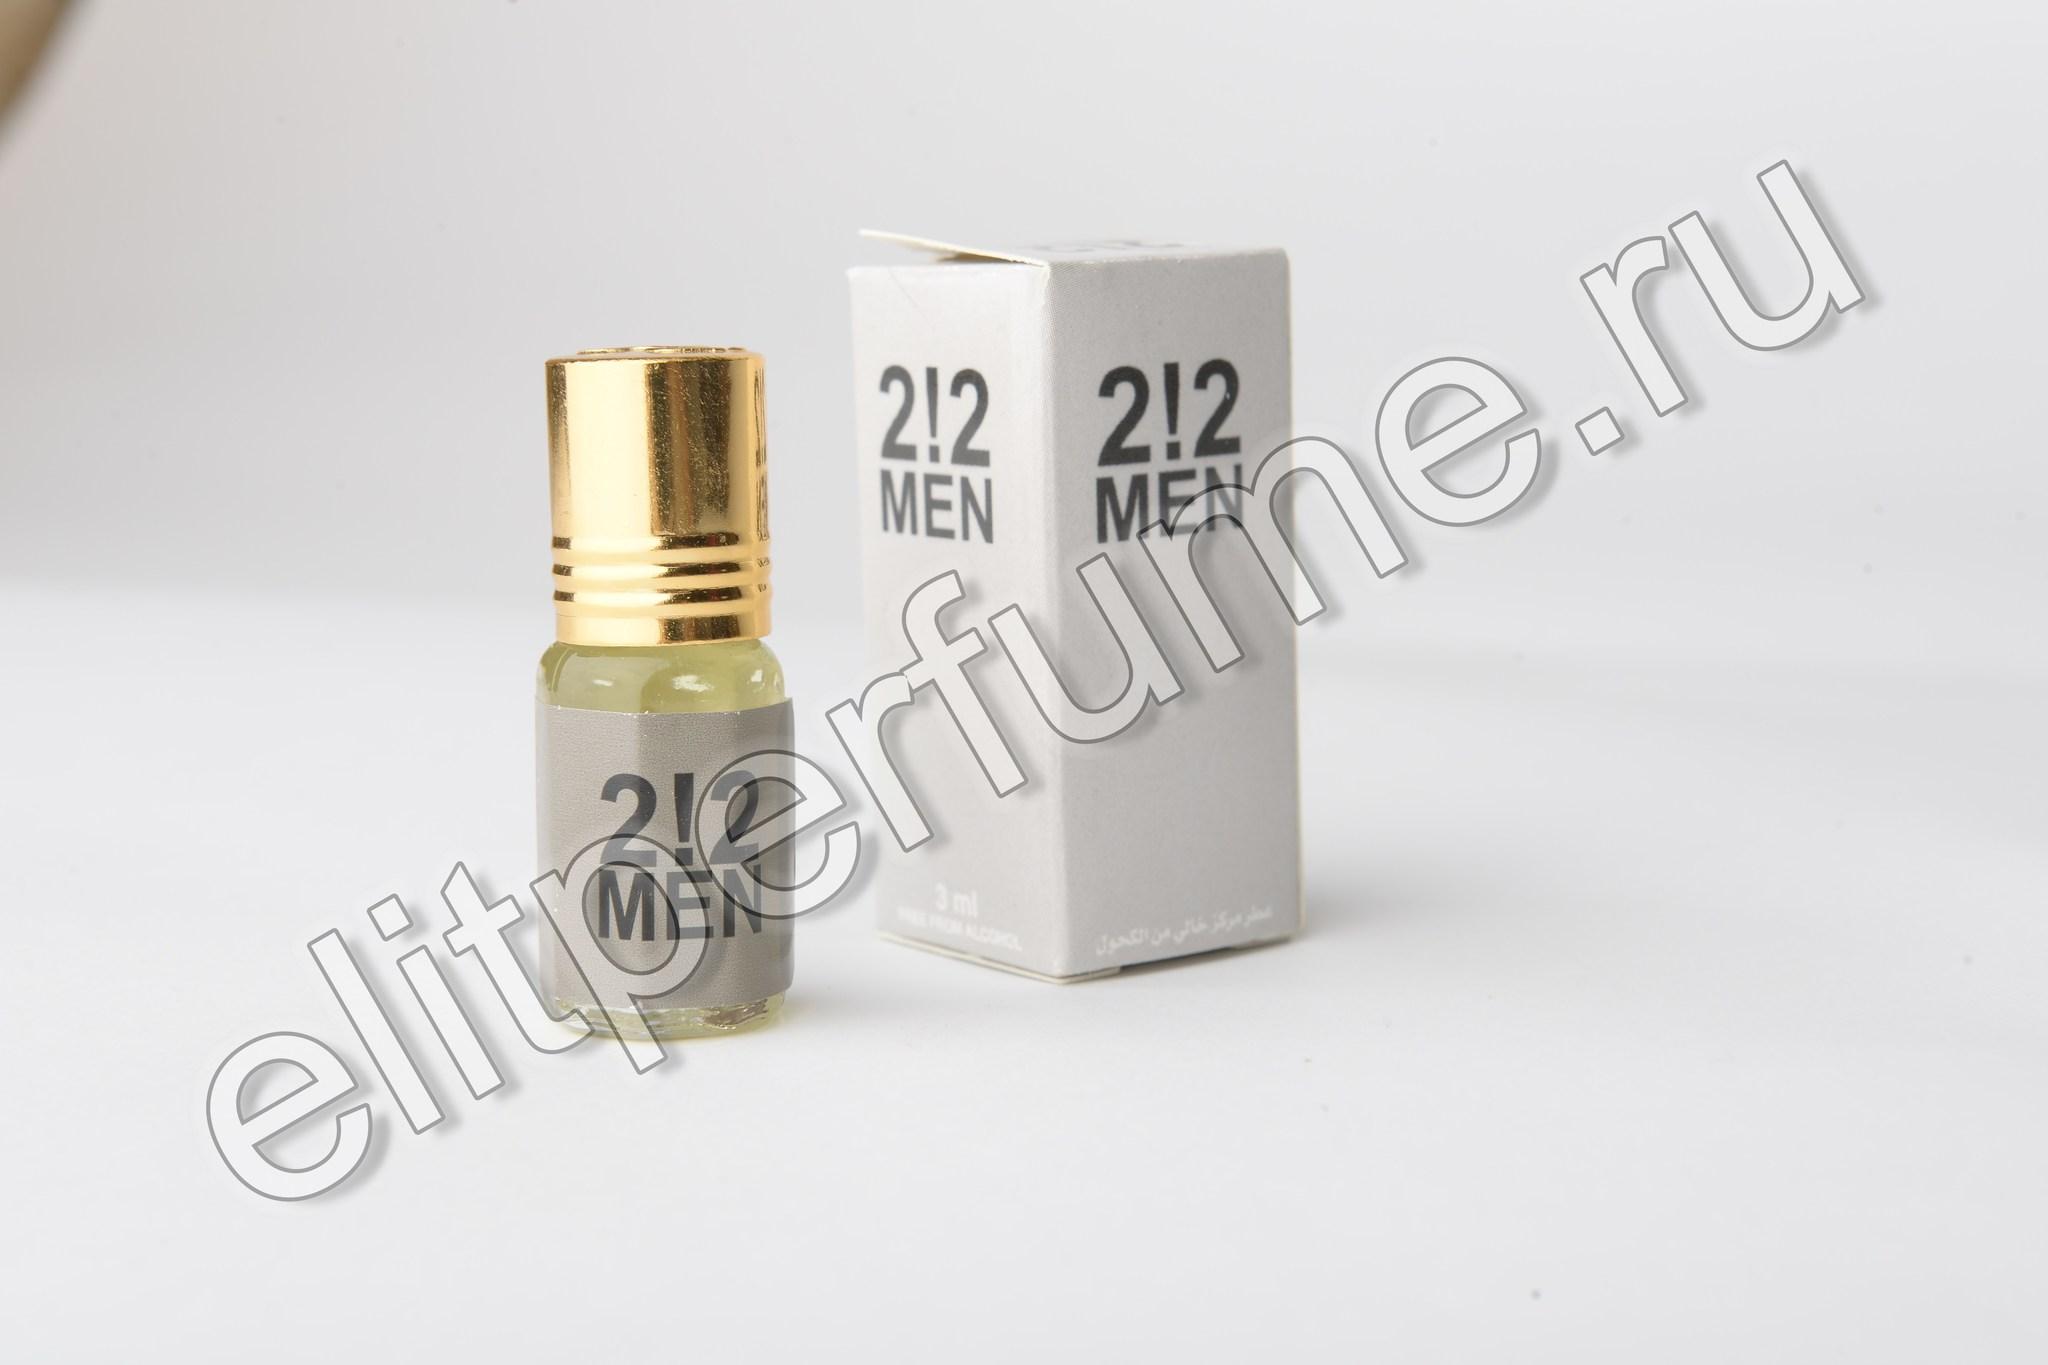 212 men 3 мл арабские мужские масляные духи от Захра Zahra Perfumes